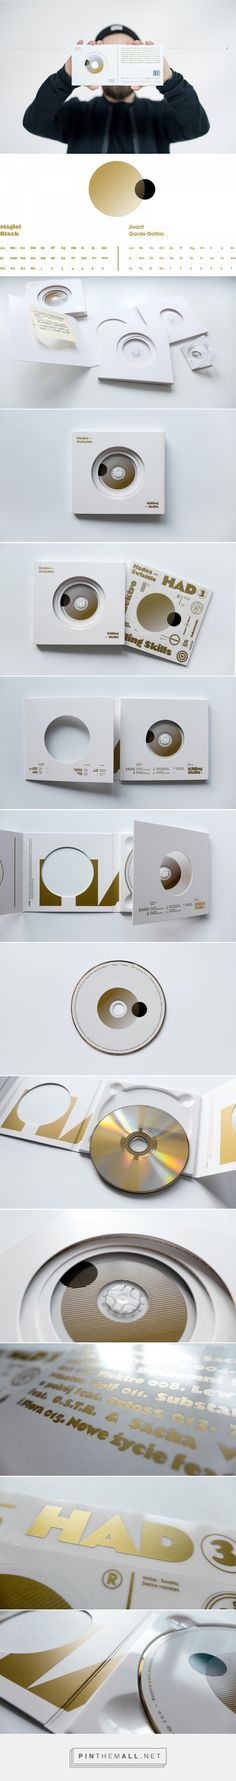 Hades - Świattło CD album design by OsomStudios - http://www.packagingoftheworld.com/2017/02/hades-swiatto-cd-packaging.html